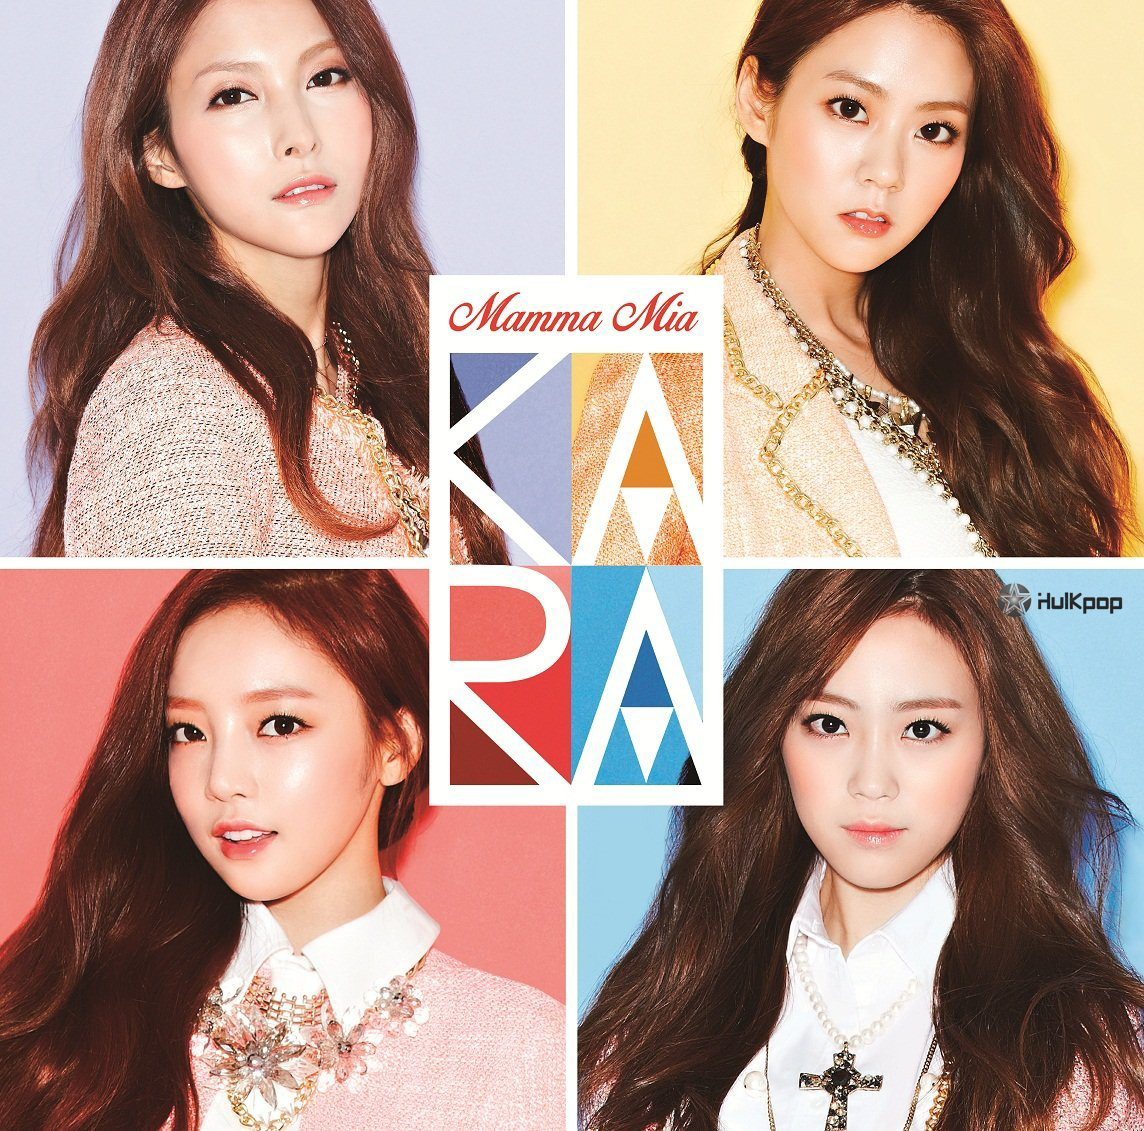 [Single] KARA – Mamma Mia! (Japanese) [Type C – FLAC]